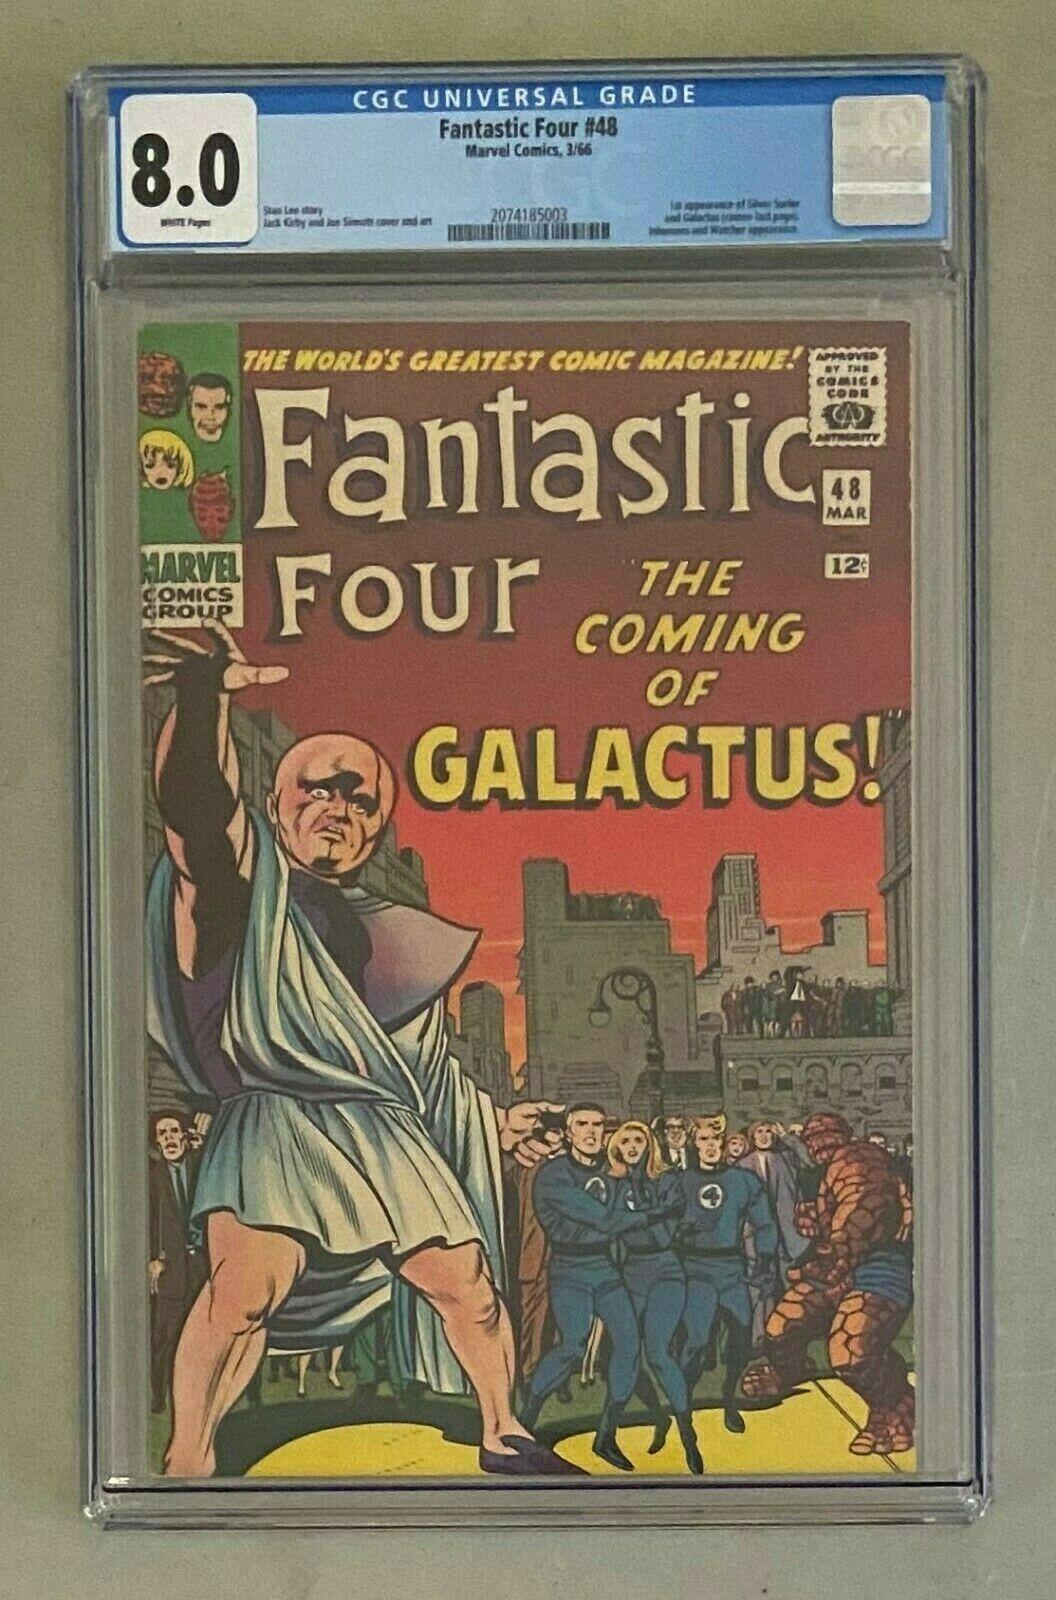 FANTASTIC 4 FOUR 48 Marvel Comics 1966 CGC 80 Silver Surfer 1st Appearance